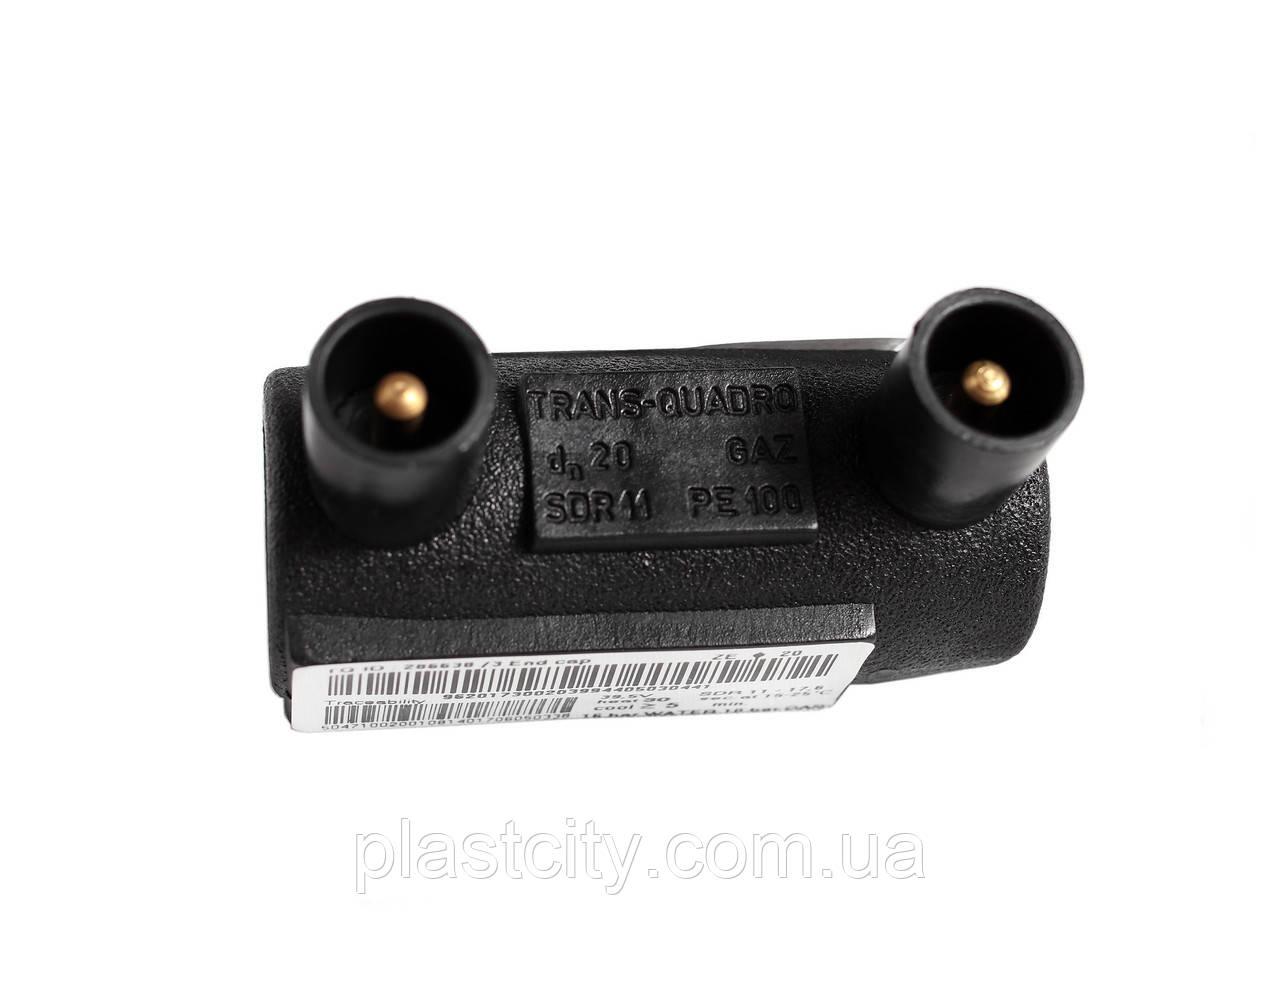 Муфта терморезисторная 110 мм ПЭ100 SDR11